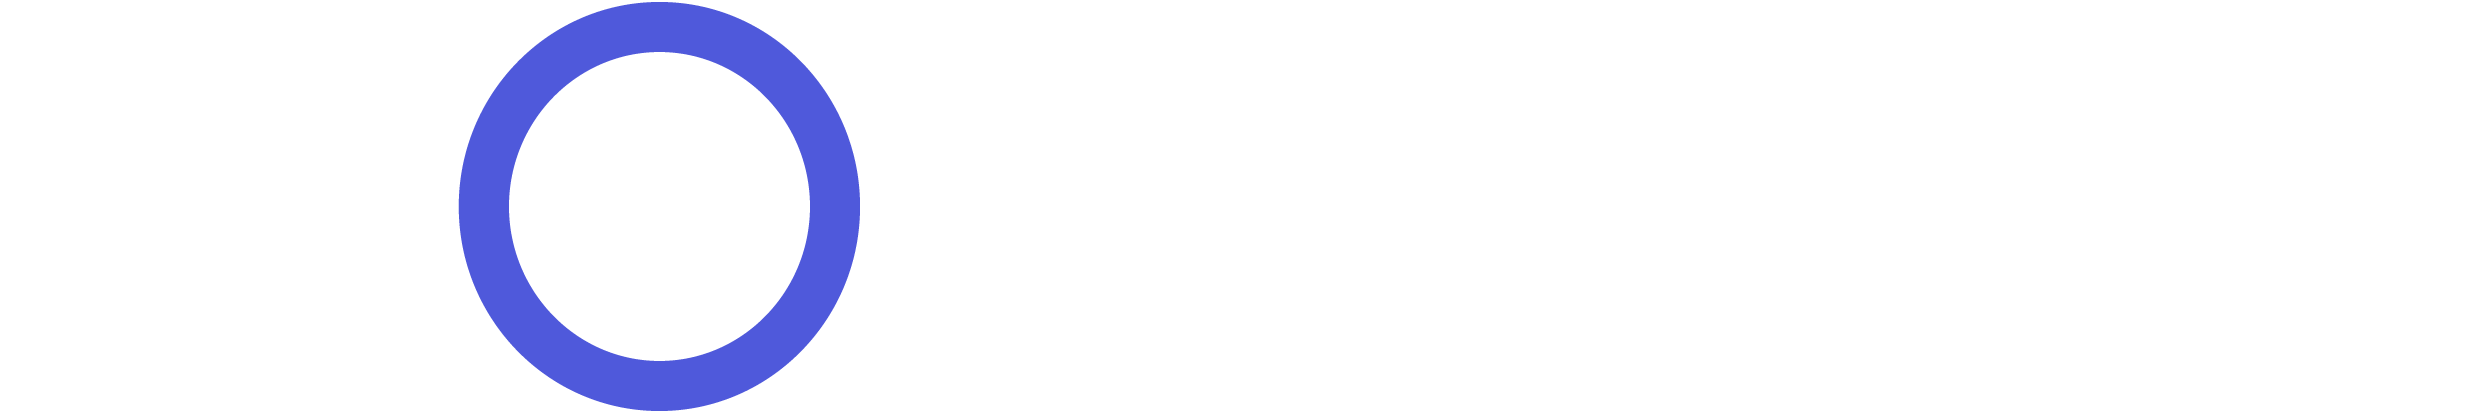 norian_logo-3-2